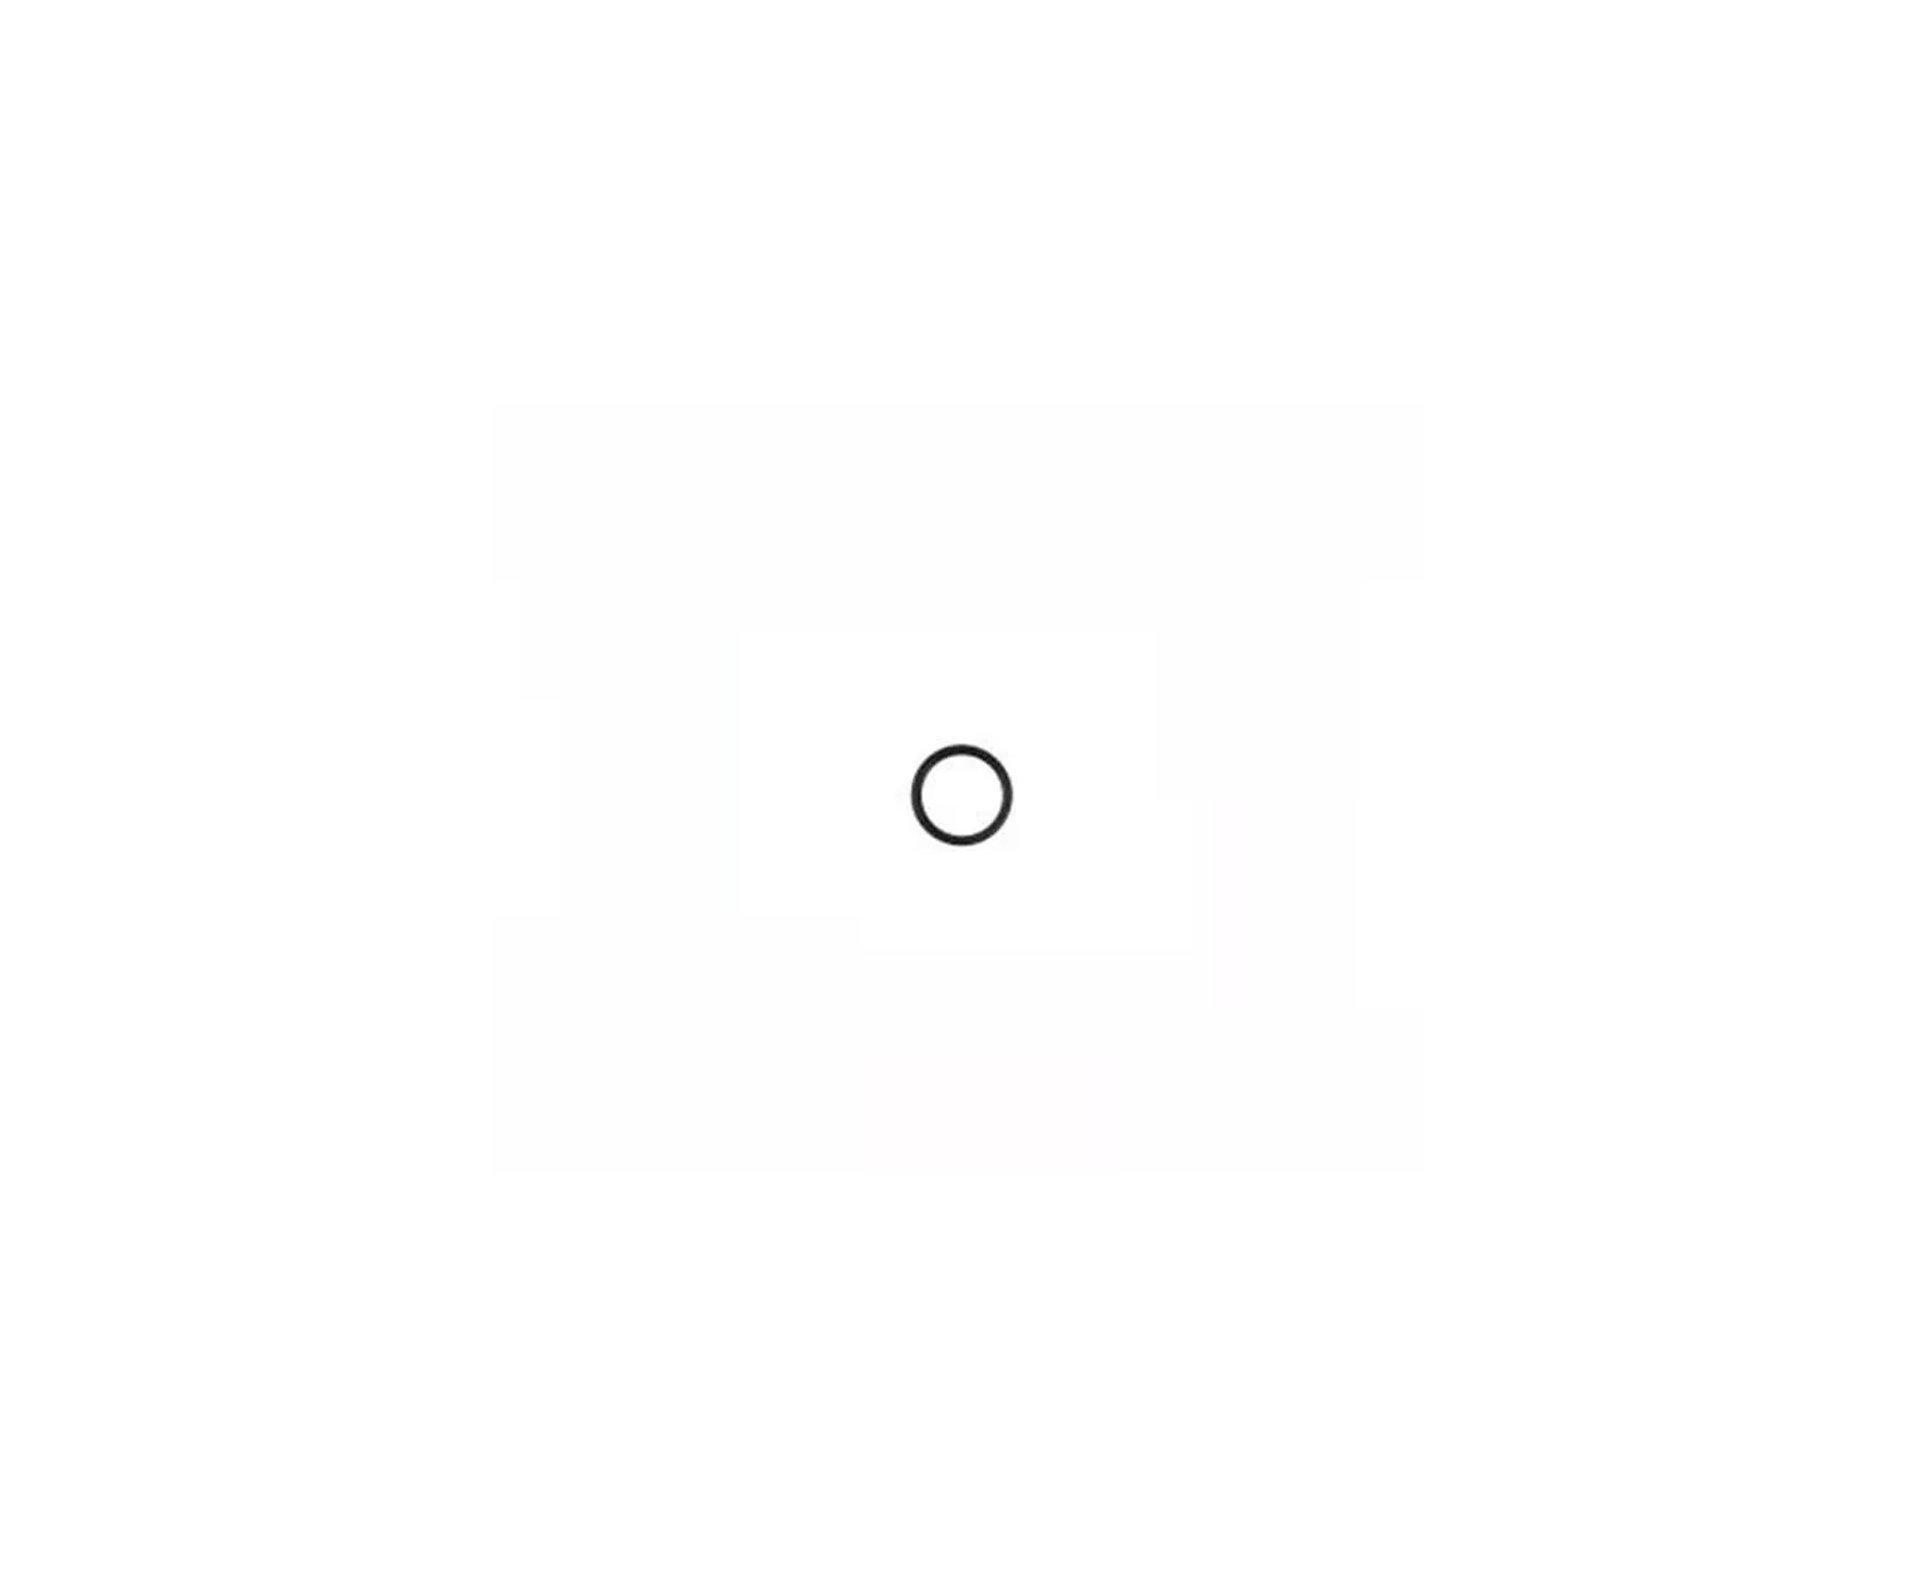 Anel Vedação Pistão Beeman 2004 Oring 20,5 X 2,8 (bee-0026)